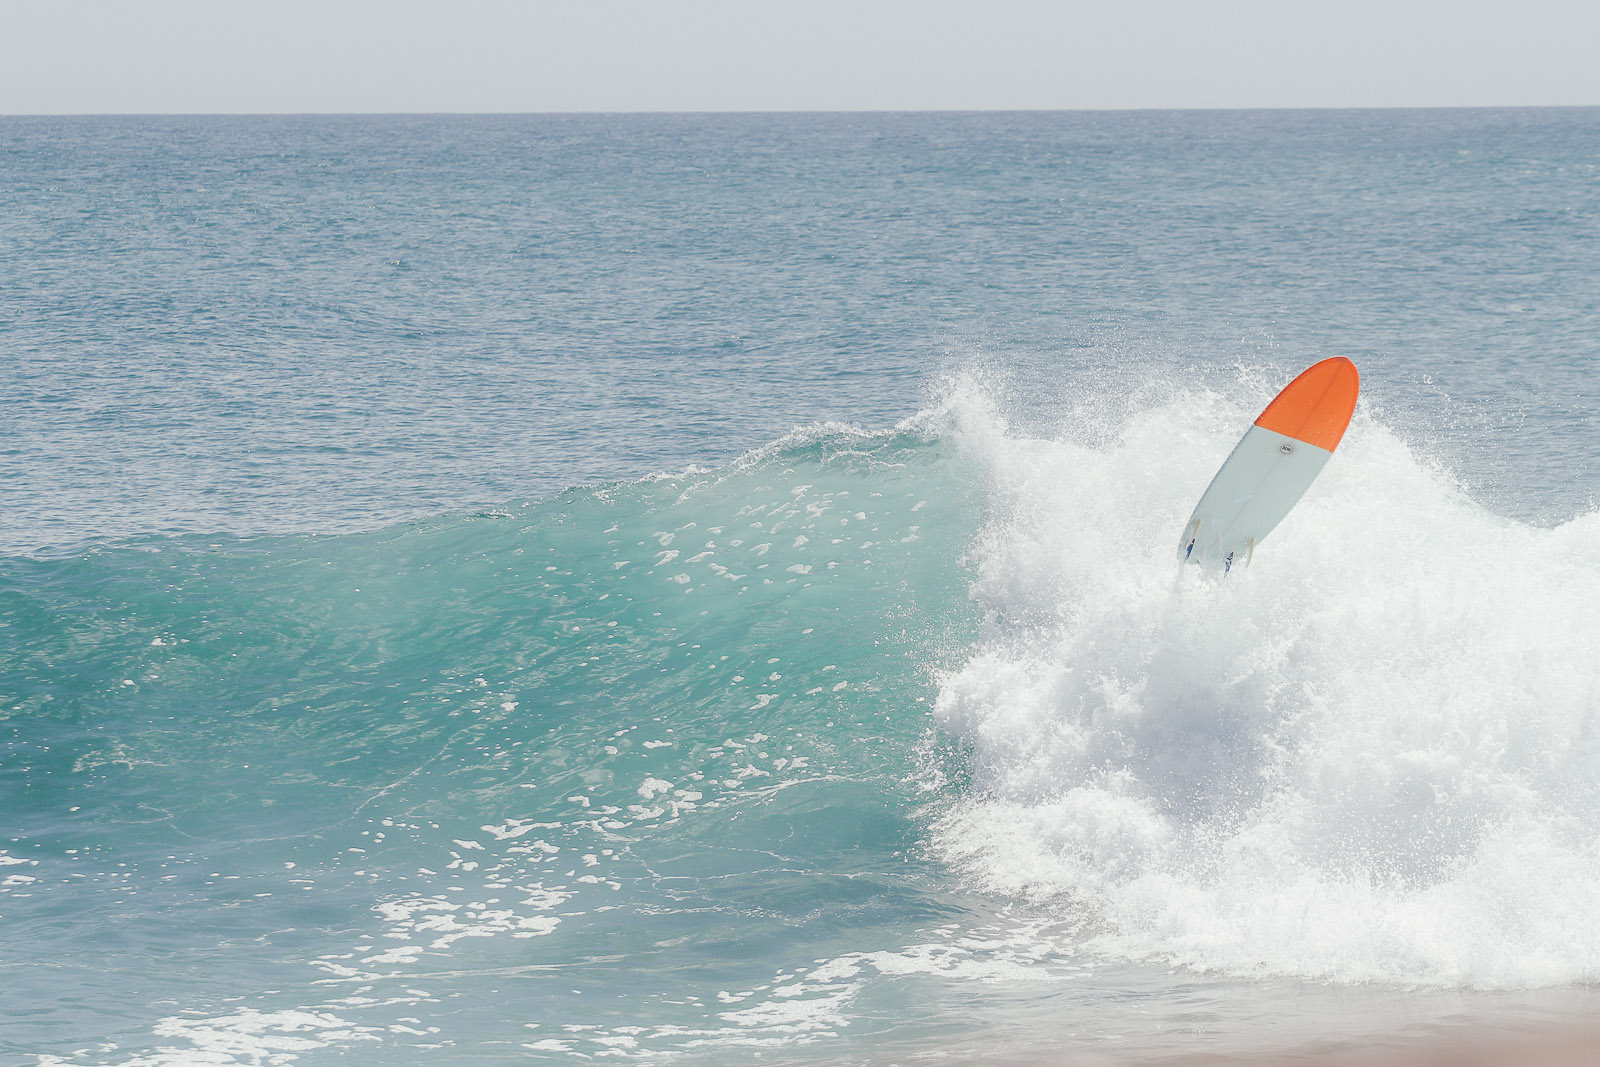 Sunshinestories-surf-travel-blog-IMG_8175